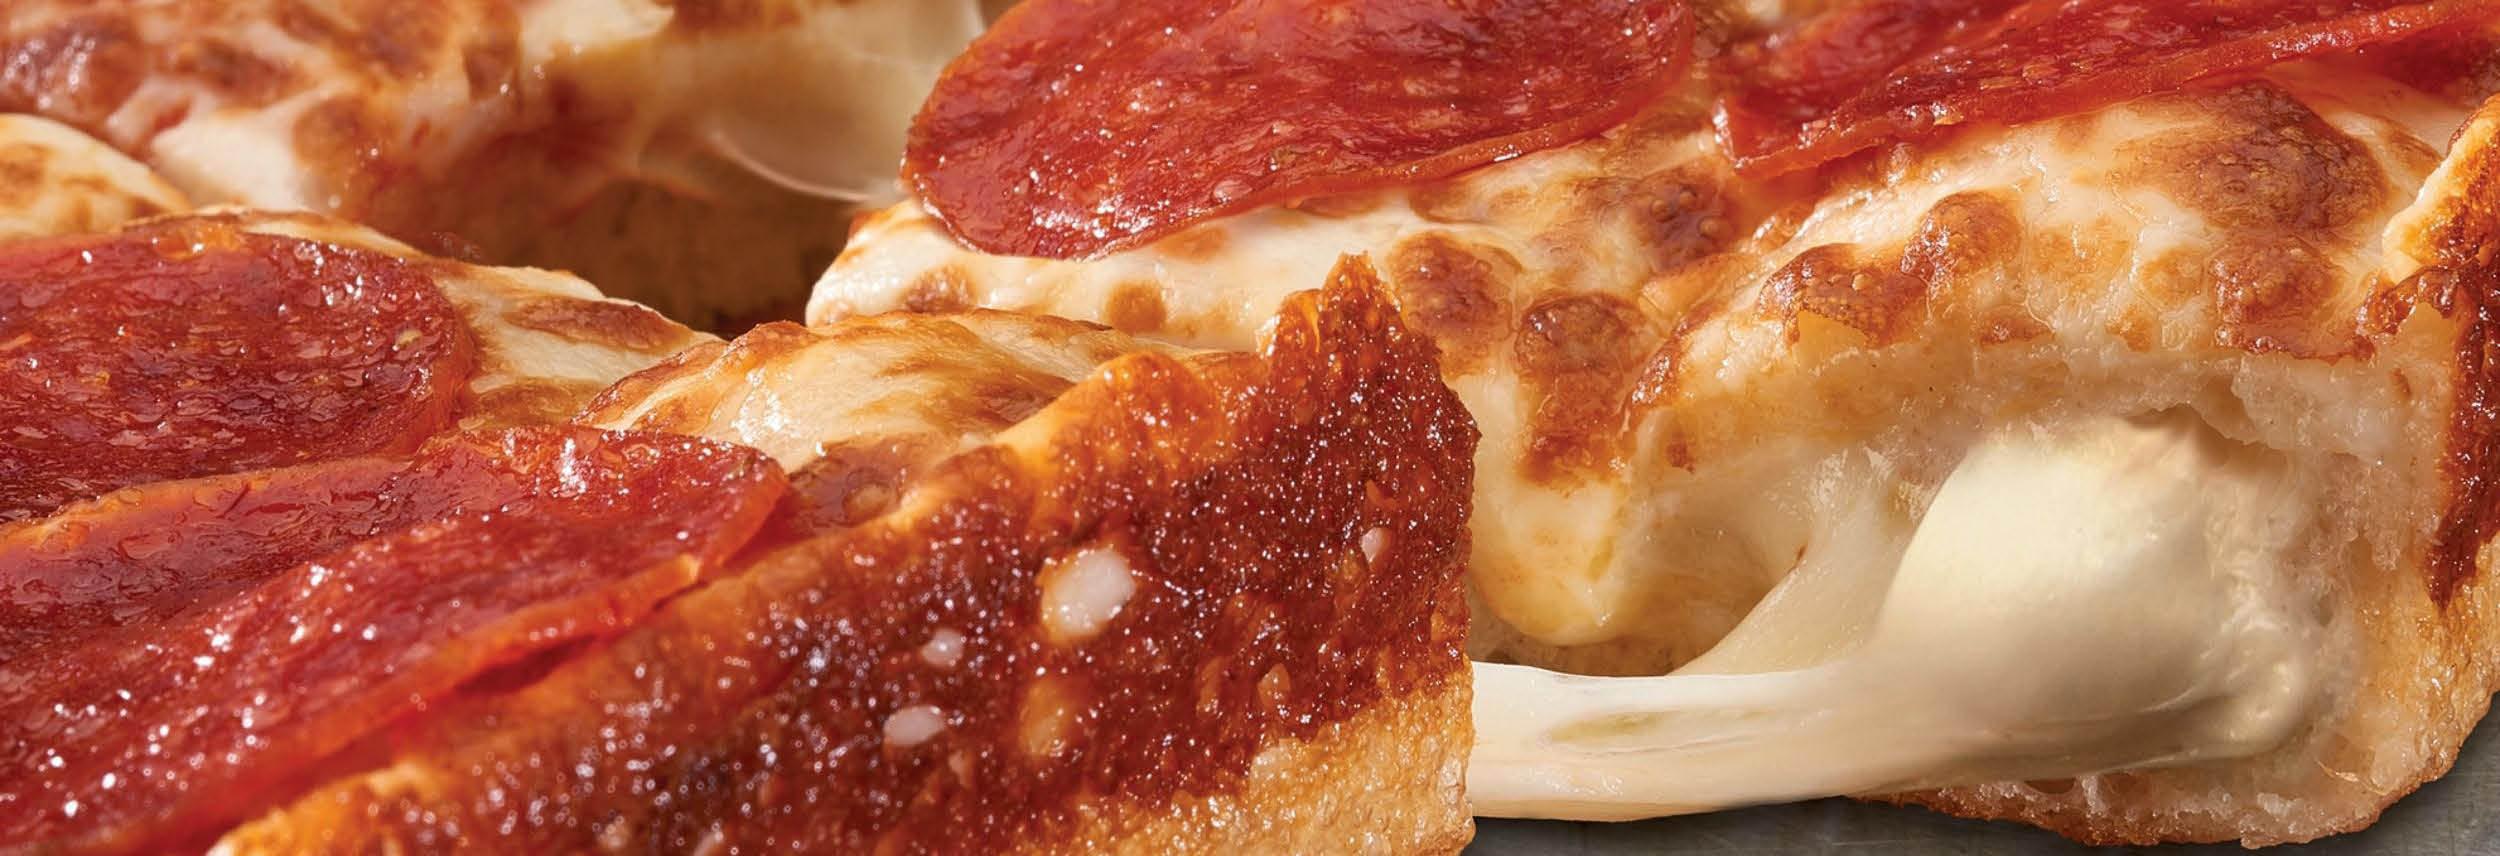 little caesars pizza $5 hot and ready pizza toledo ohio maumee ohio quick dinner options maumee